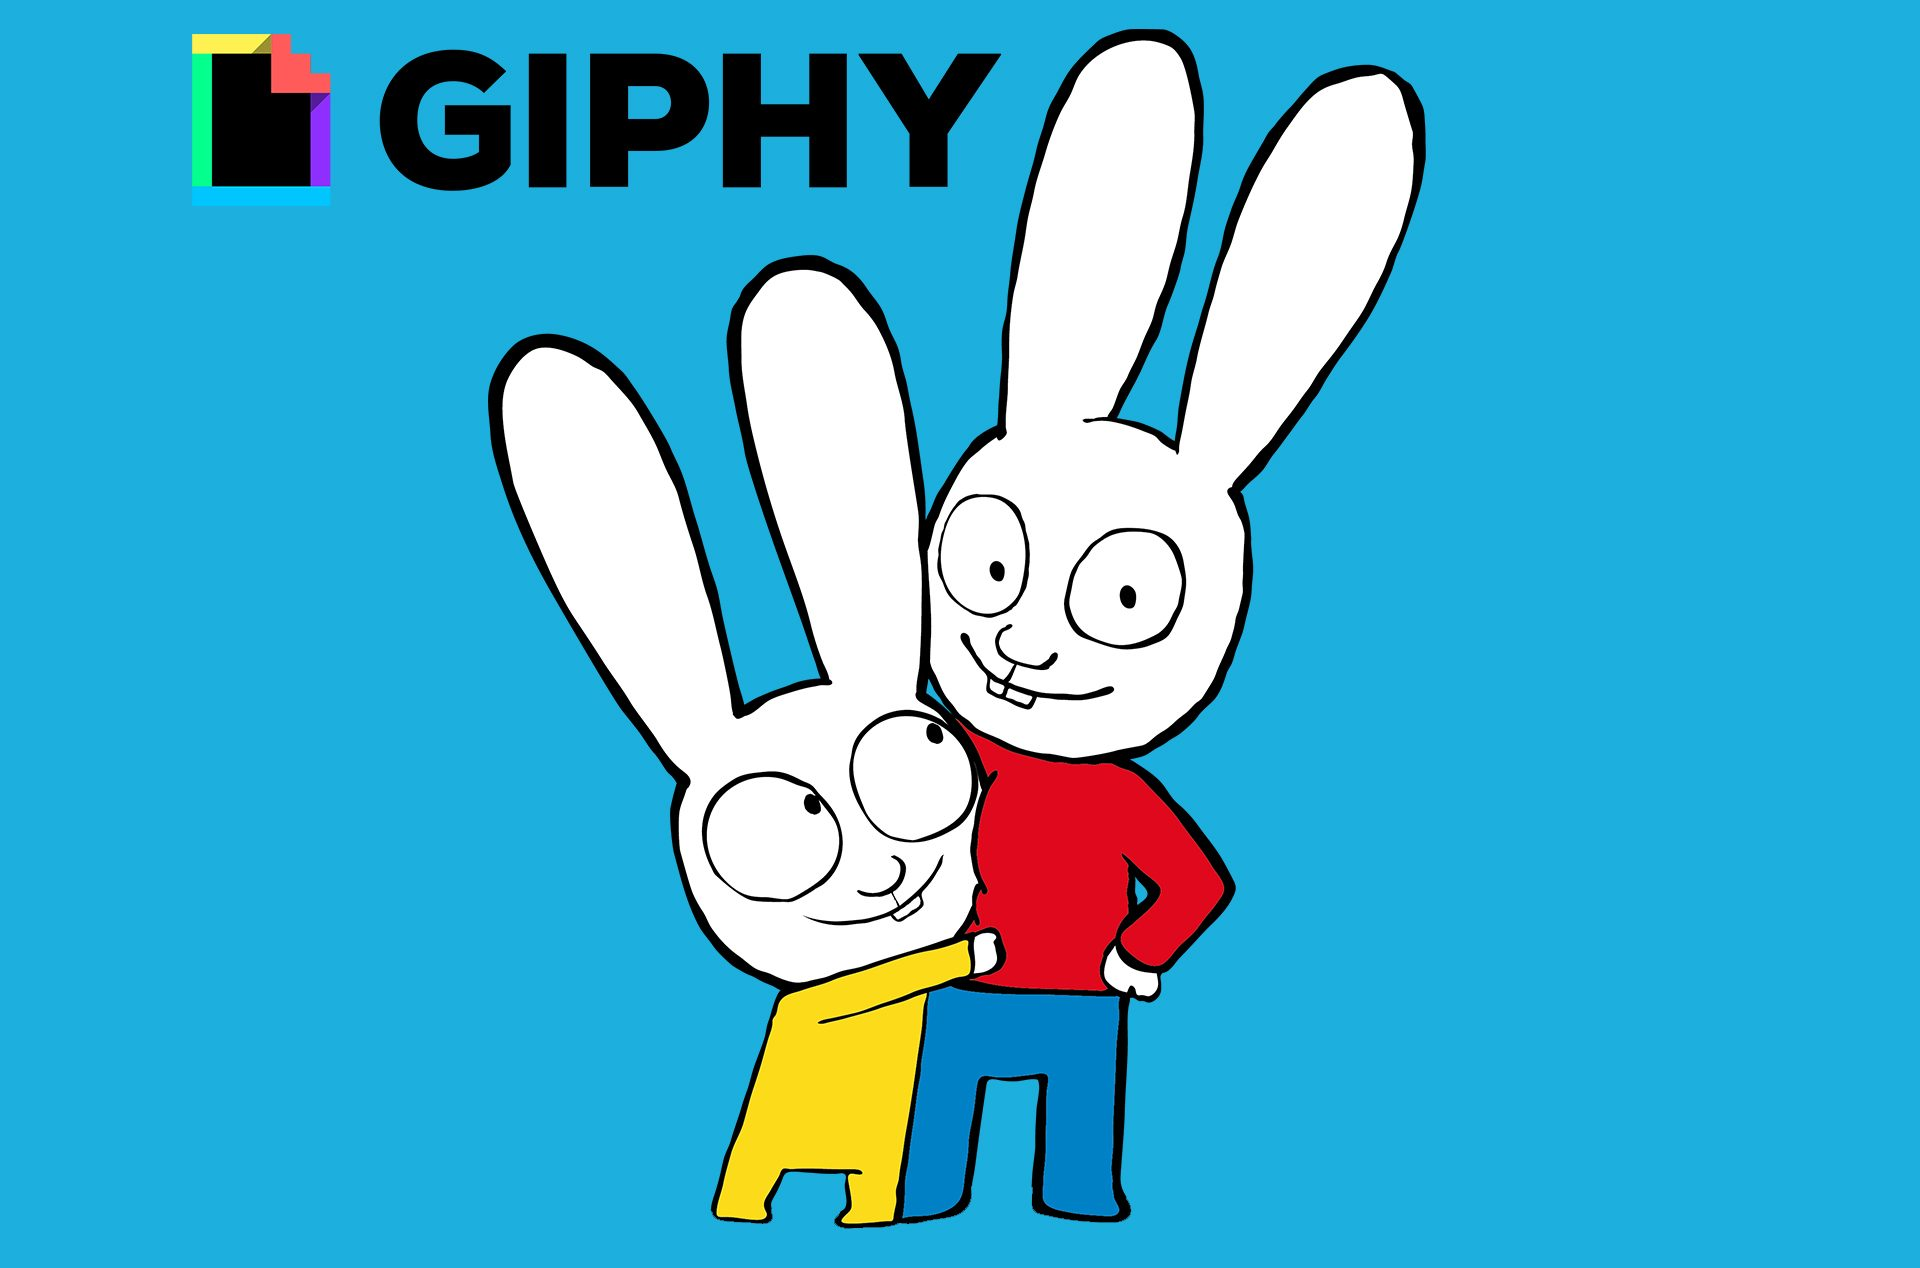 Simon Giphy